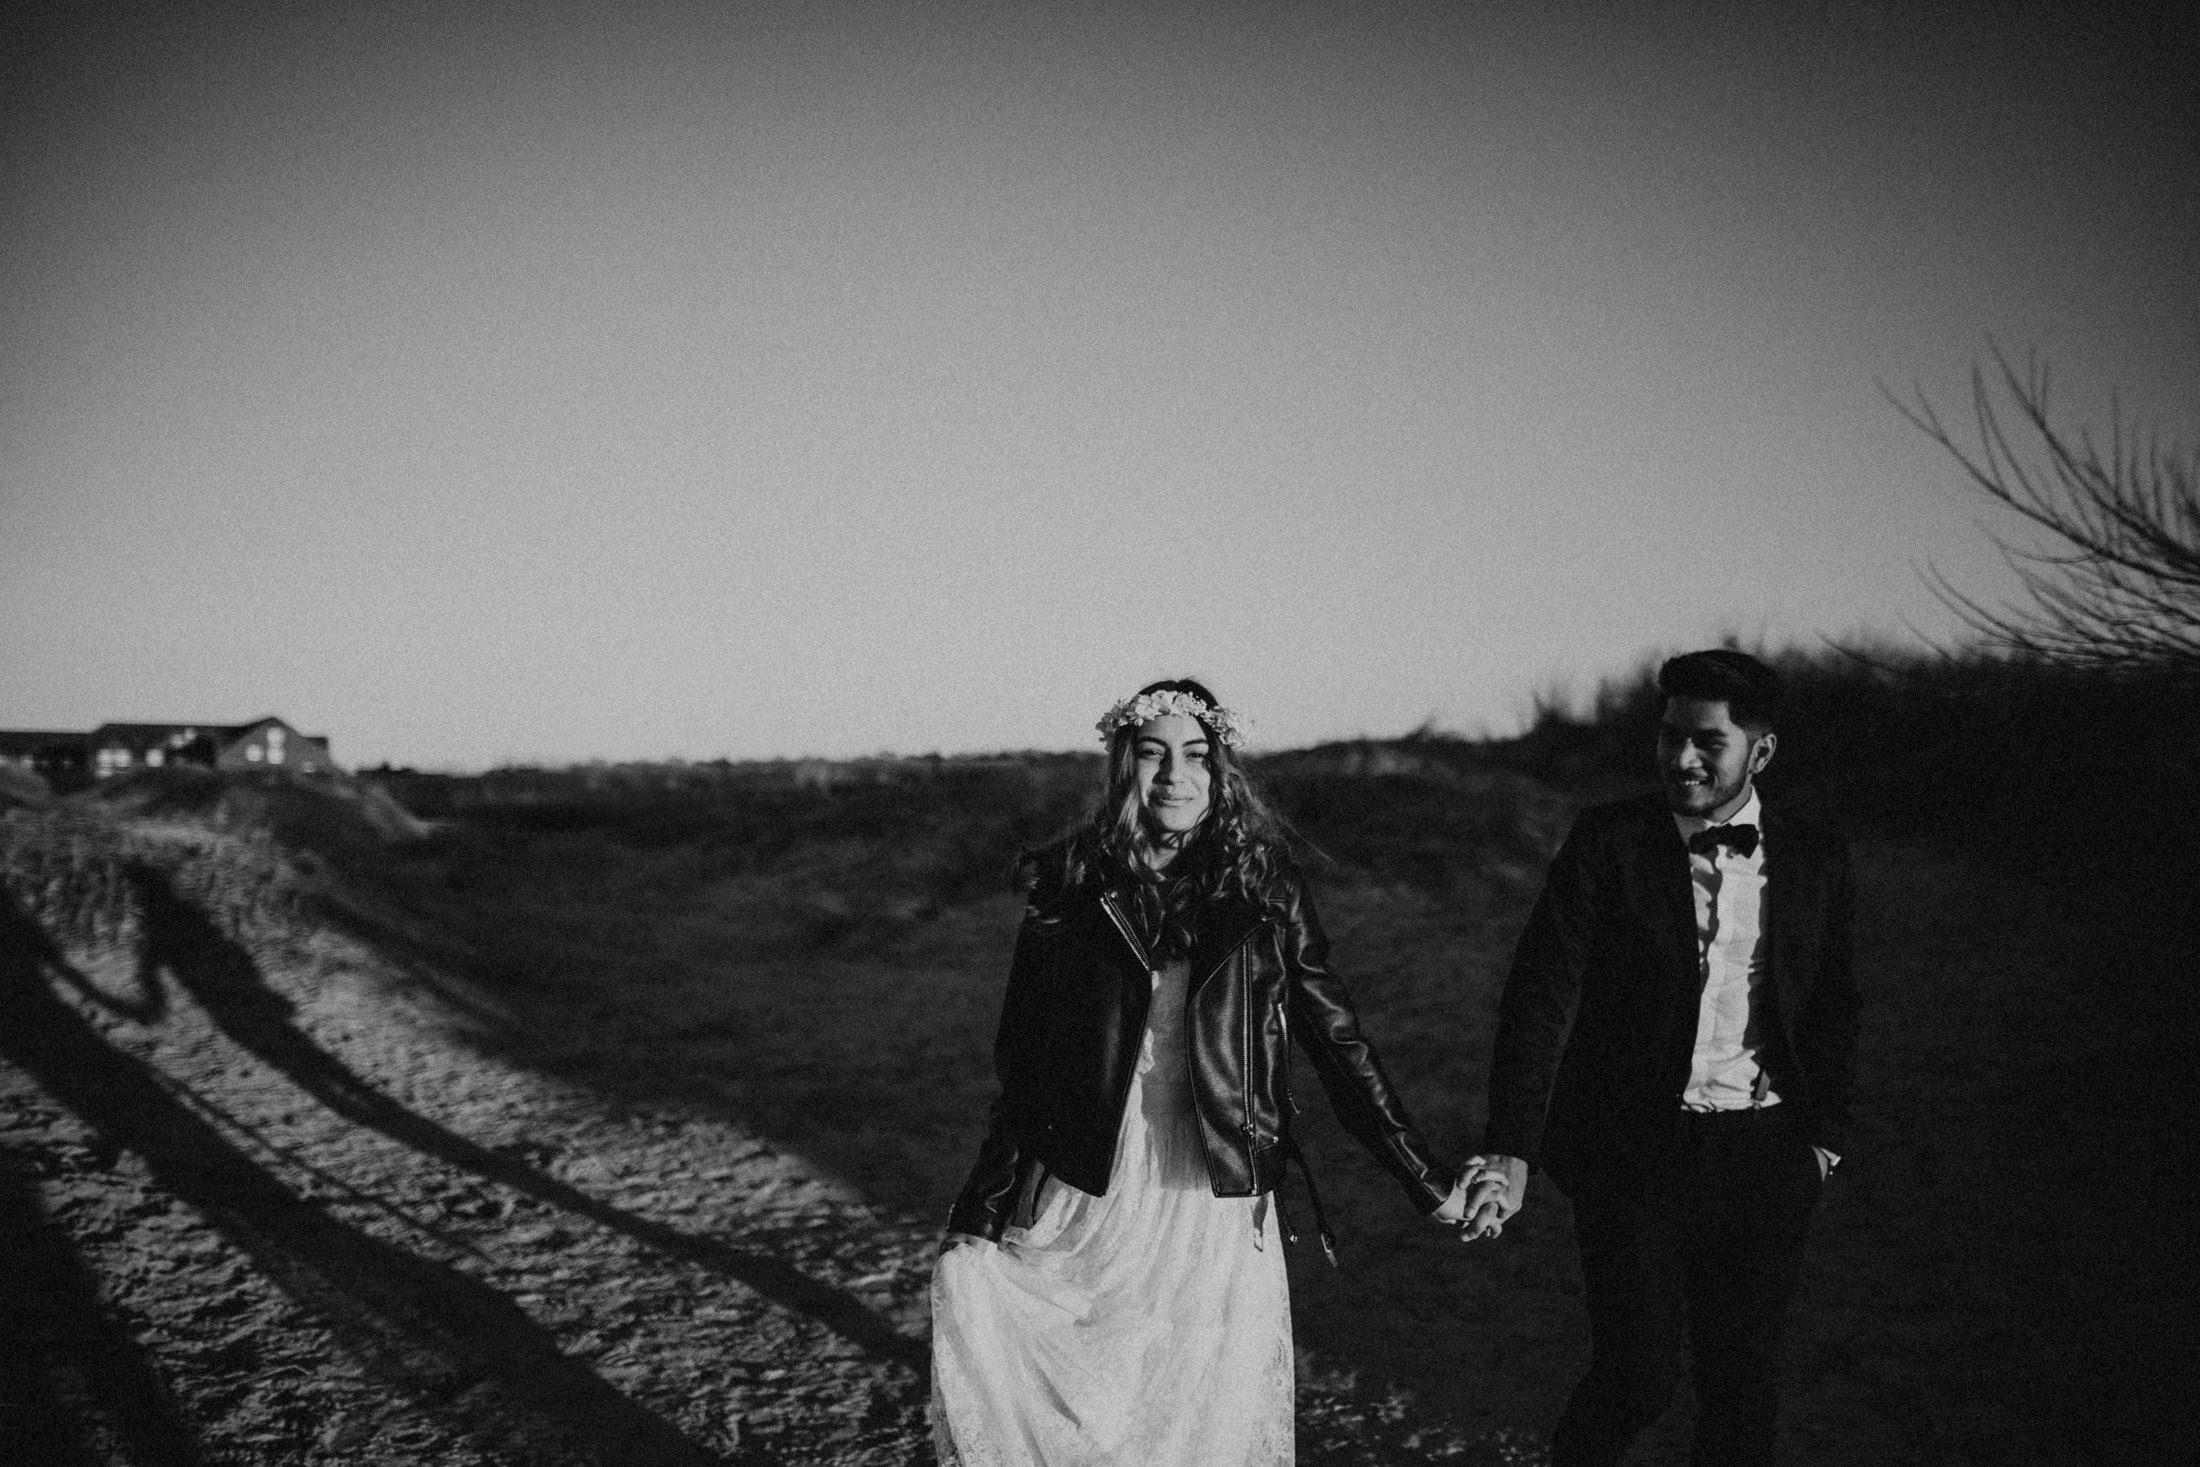 Wedding_Photographer_Mallorca_Daniela-Marquardt_Photography_CanaryIslands_Lanzarote_Iceland_Tuskany_Santorini_Portugal_Schweiz_Austria_Bayern_Elopement_Hochzeitsfotograf_Norddeichich_8